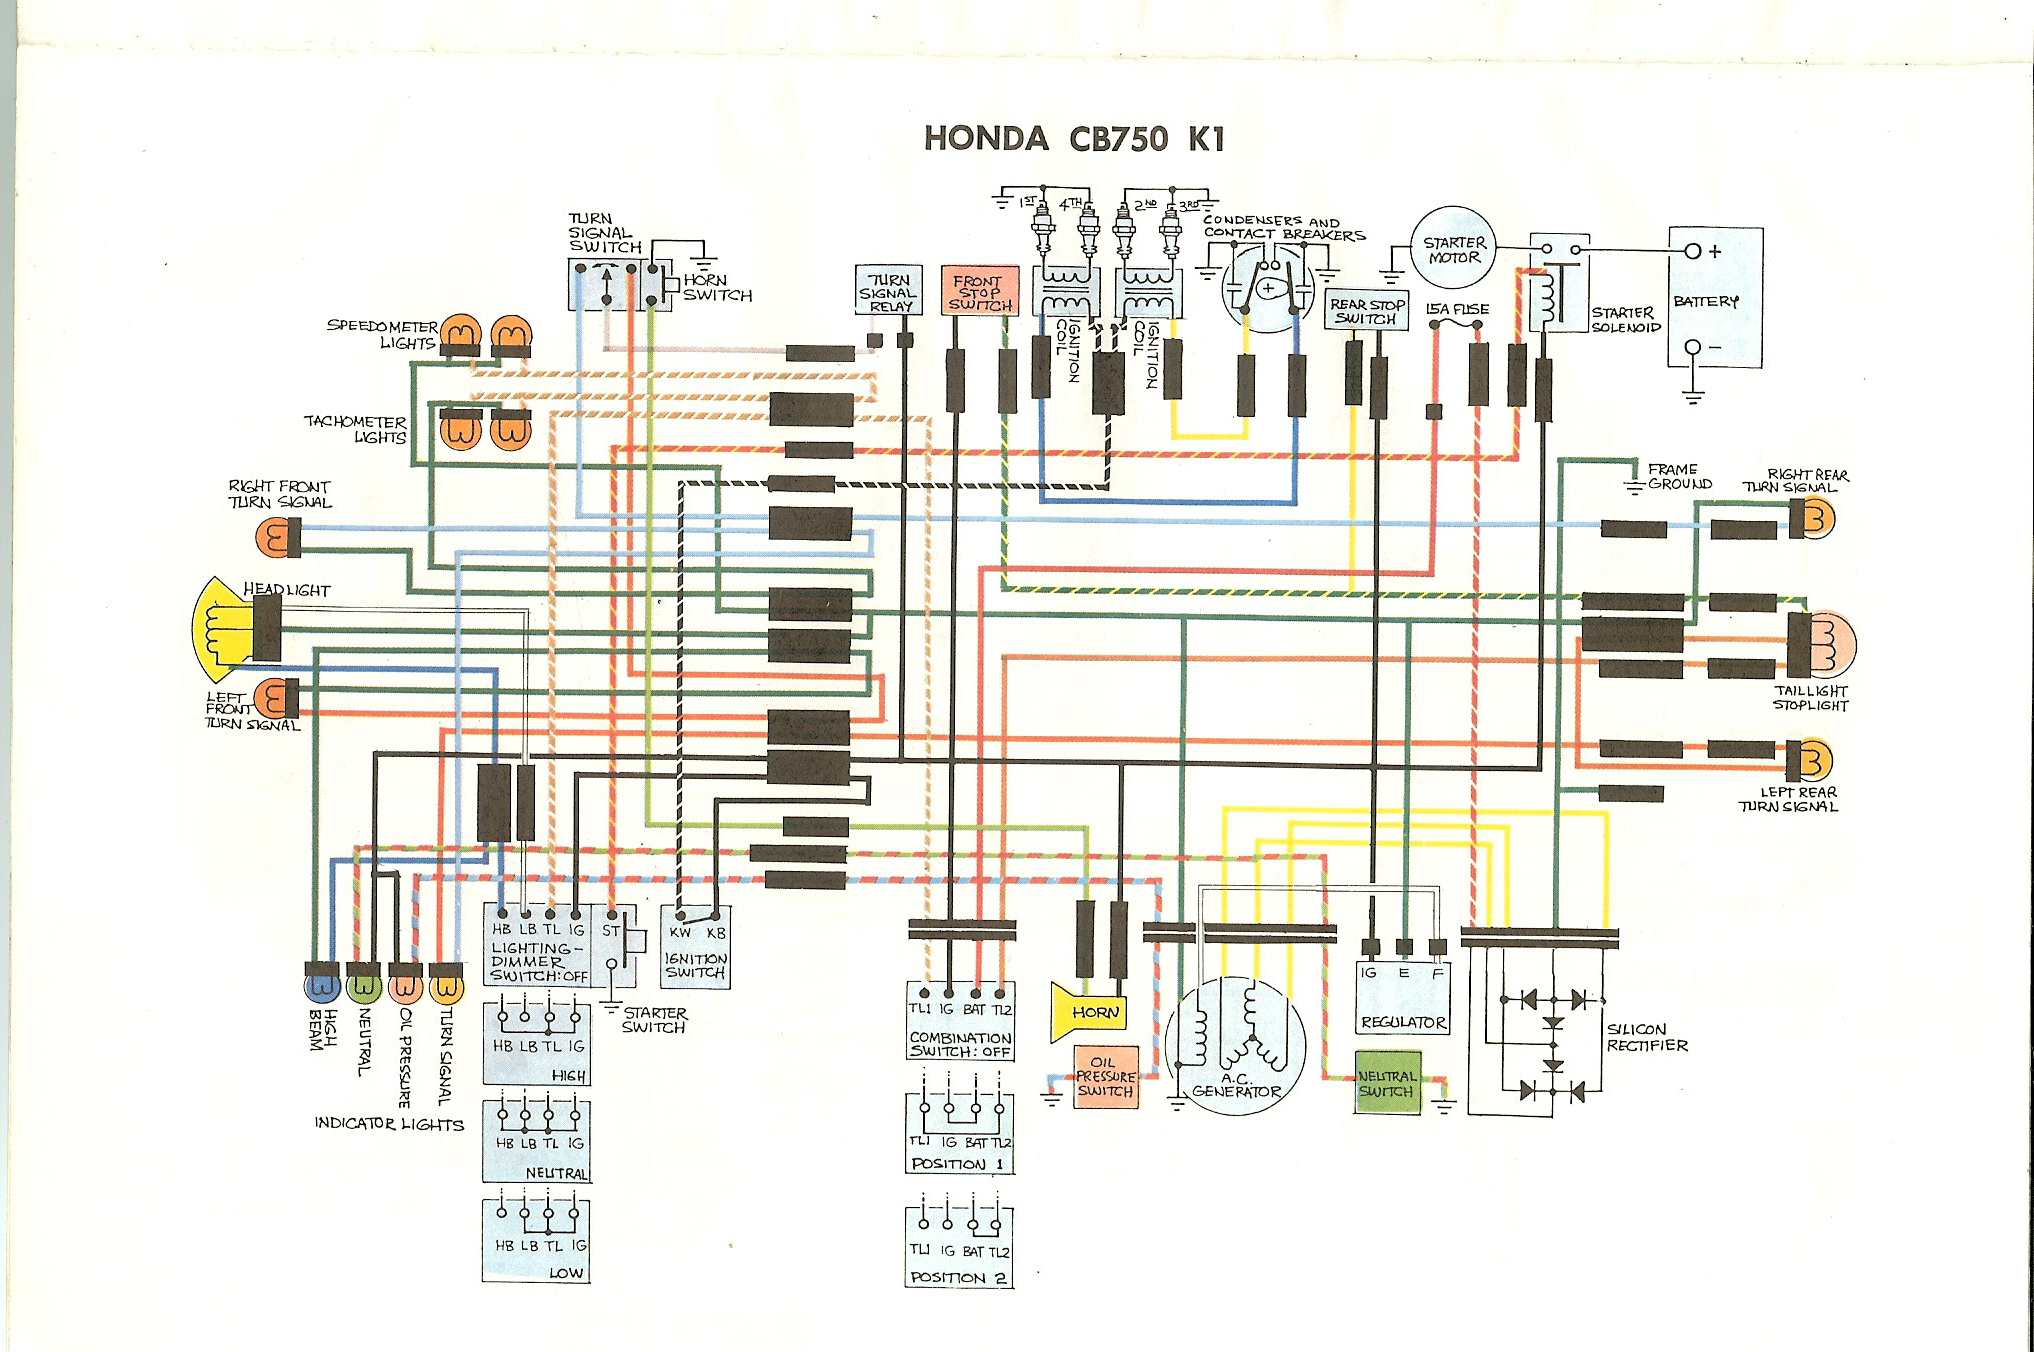 1971 Ct90 Wiring Diagram Schematic Diagrams Honda CT90 Parts Diagram 1971 Honda  Ct90 Wiring Diagram